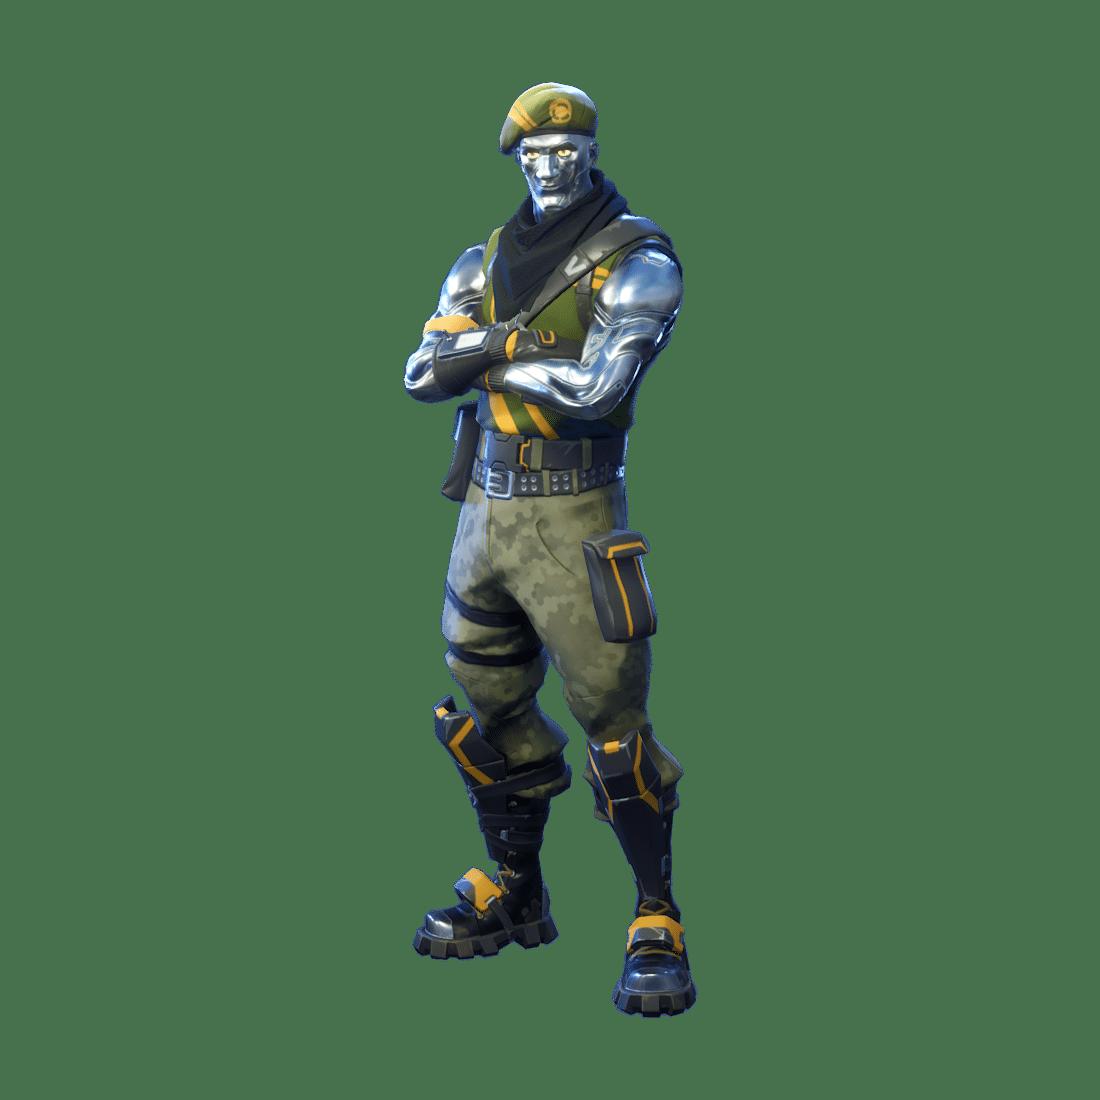 Fortnite Skin - Diecast